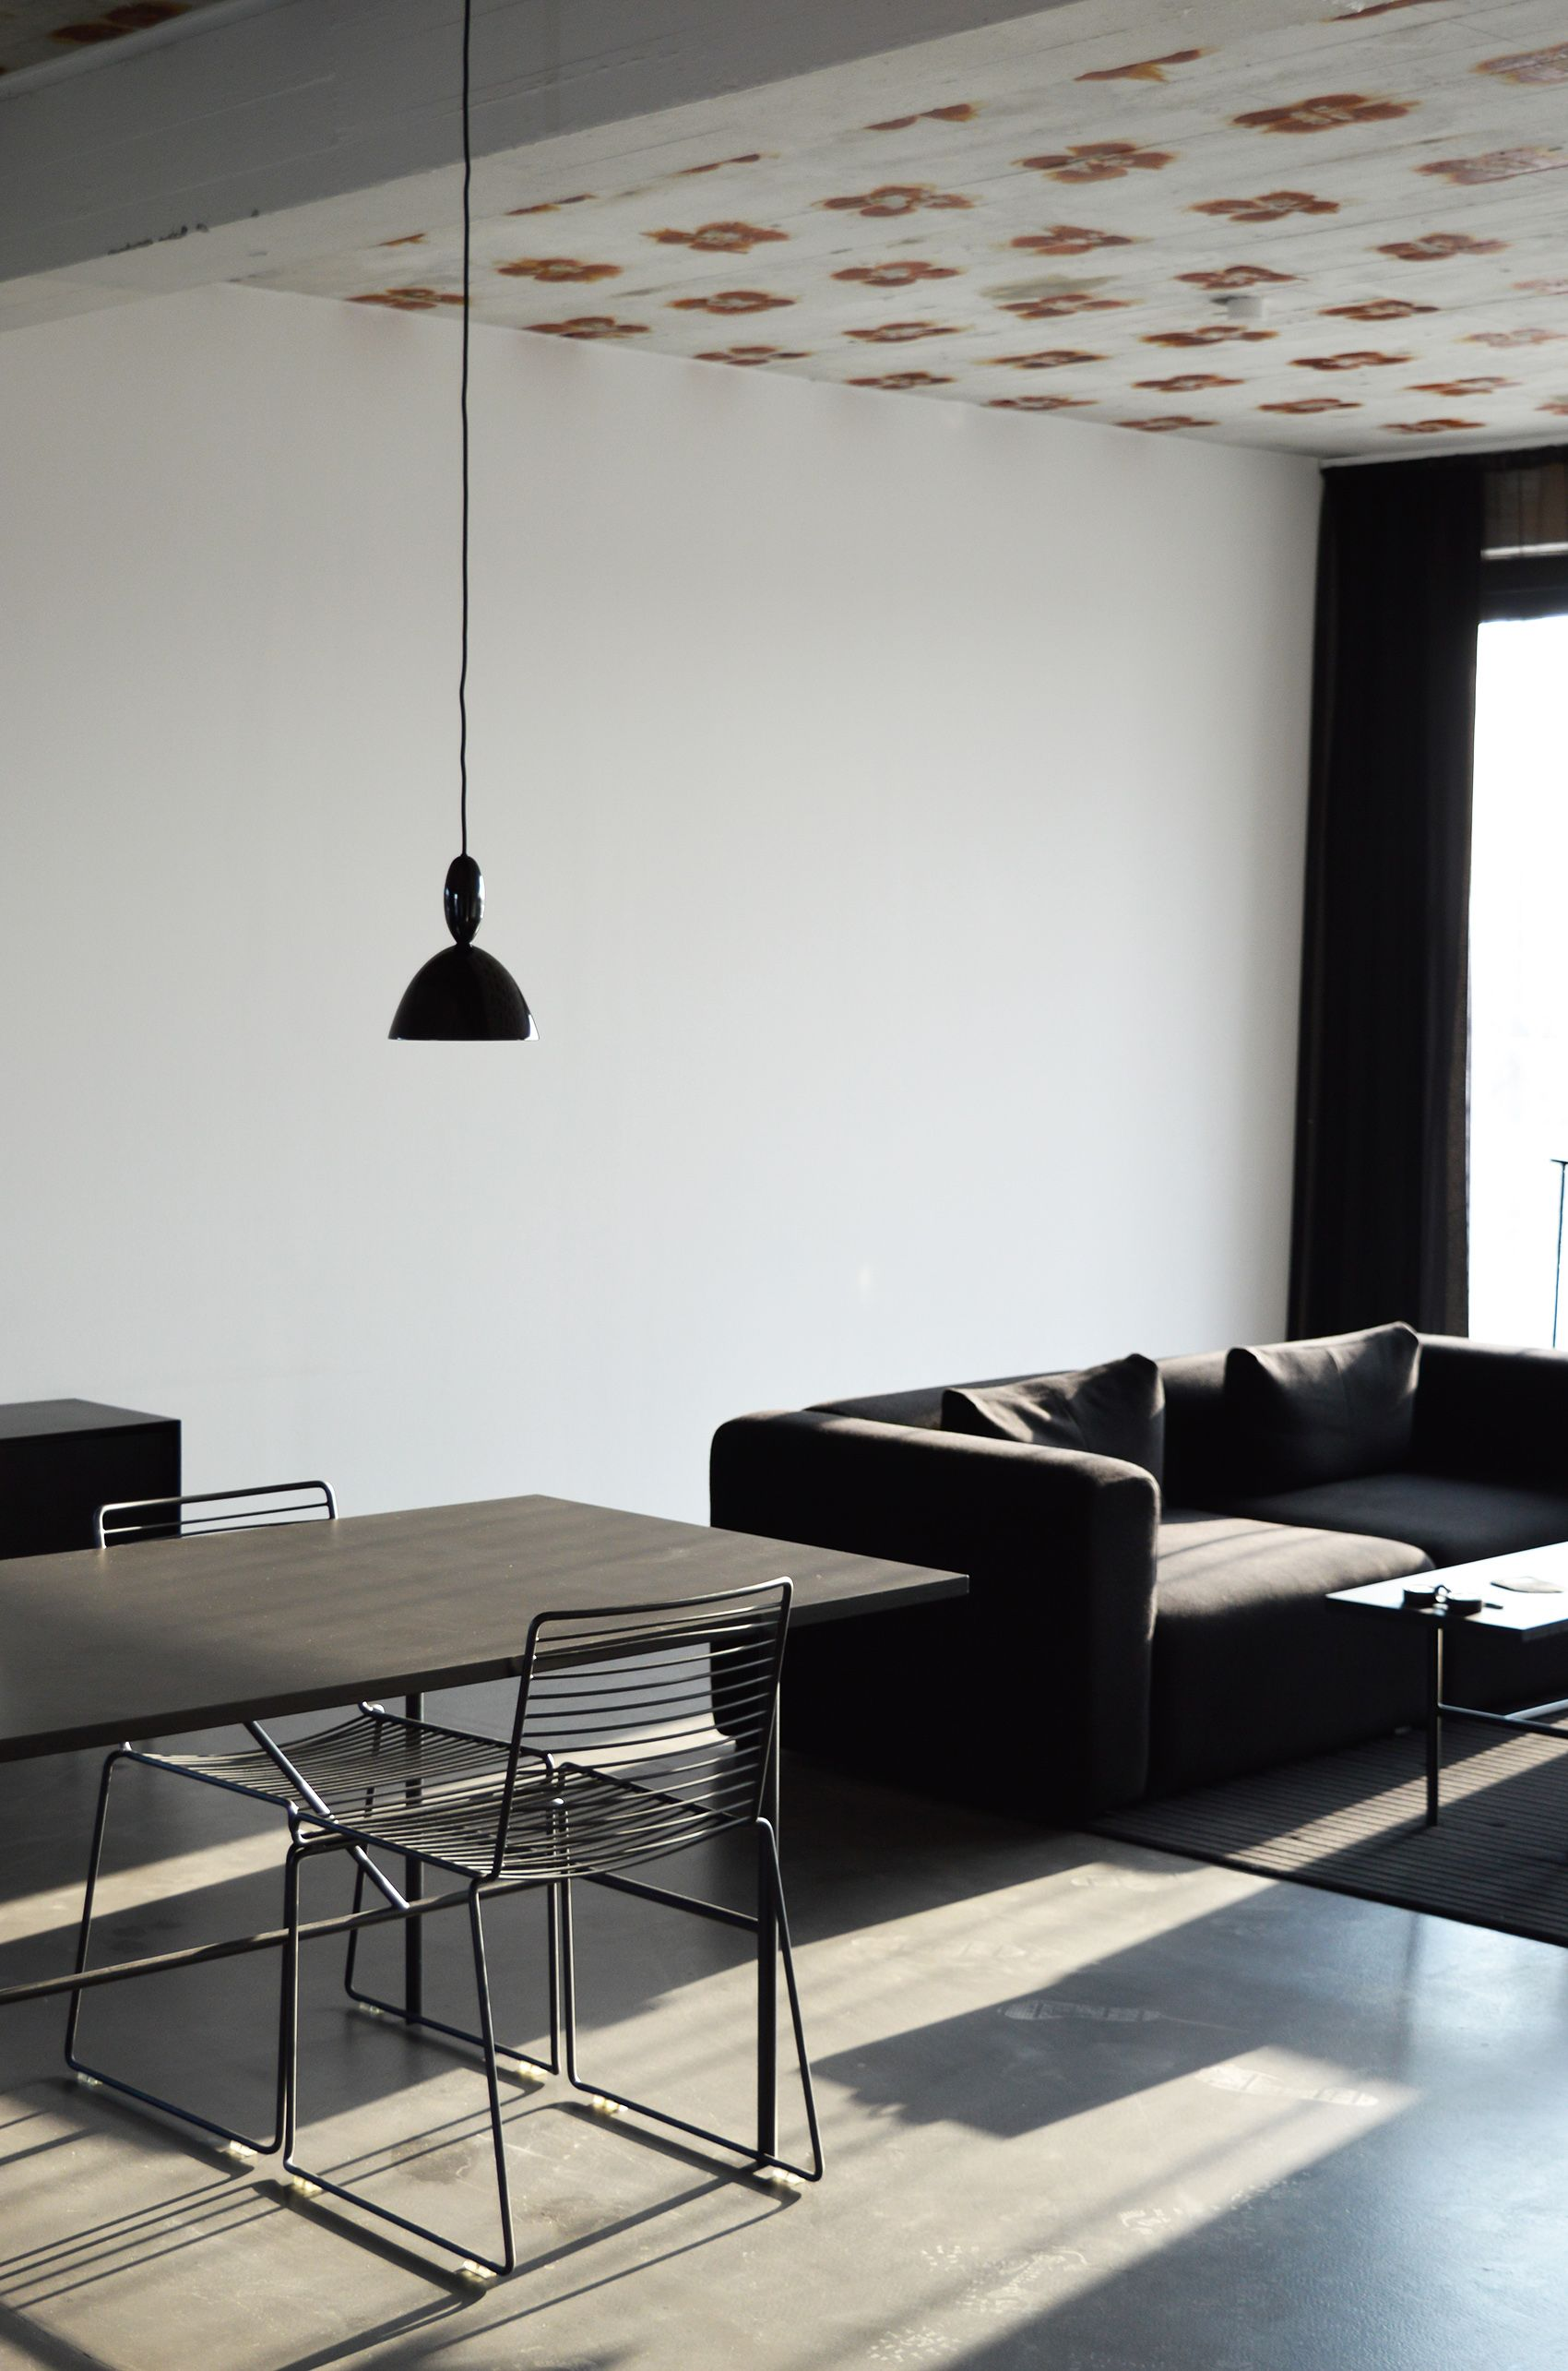 Minimalist Hotel Room: A Minimalist Apartment At STAY Copenhagen